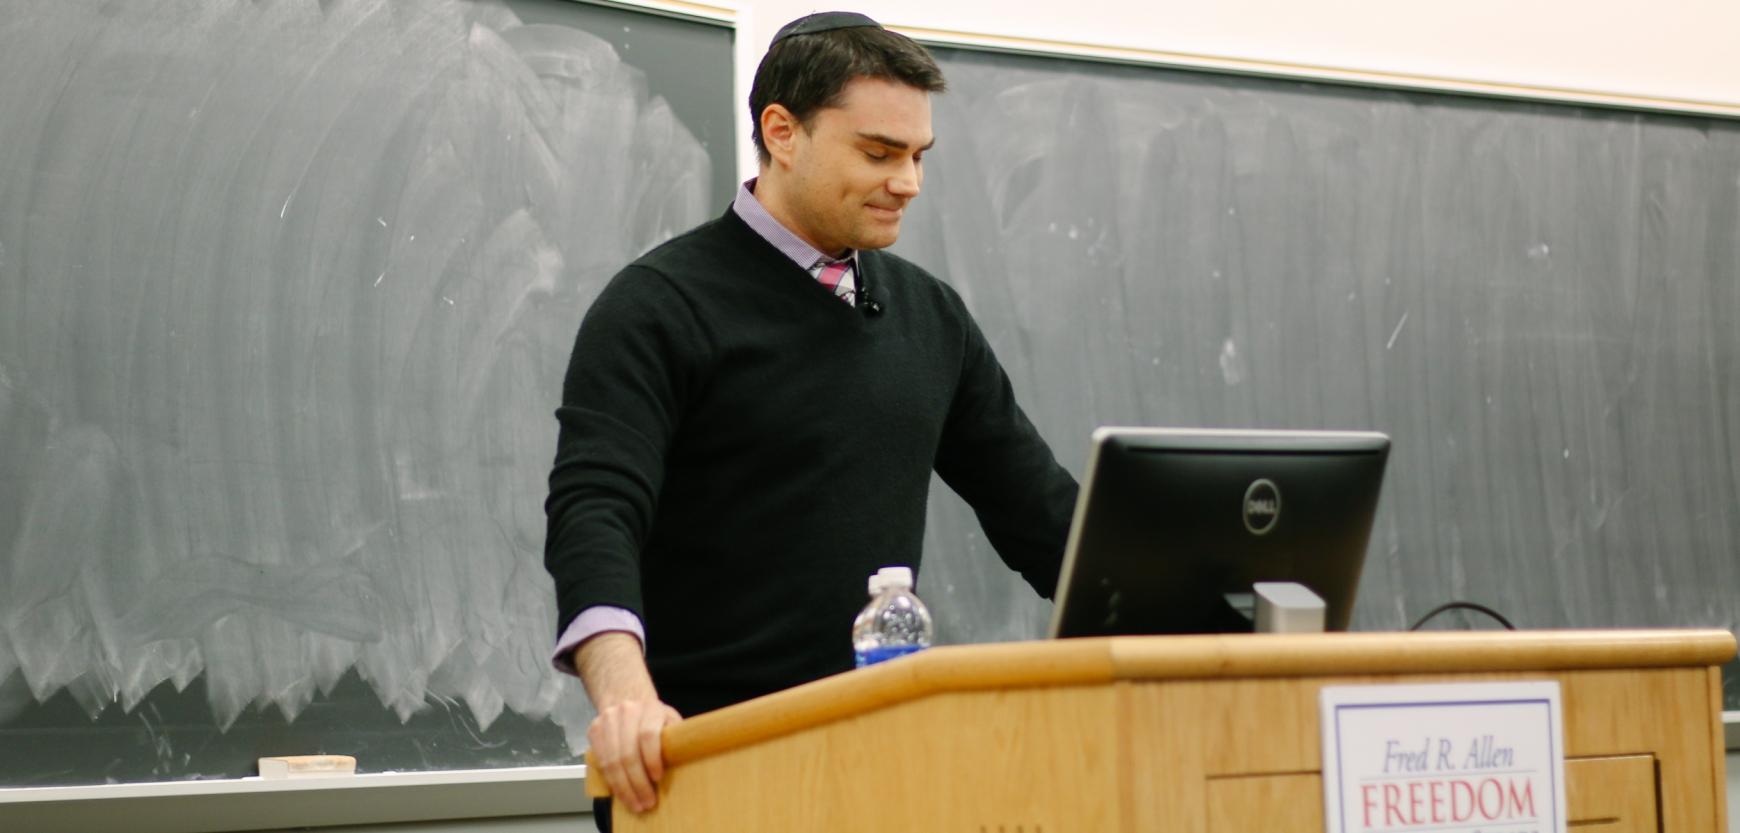 Ben Shapiro The Student Room